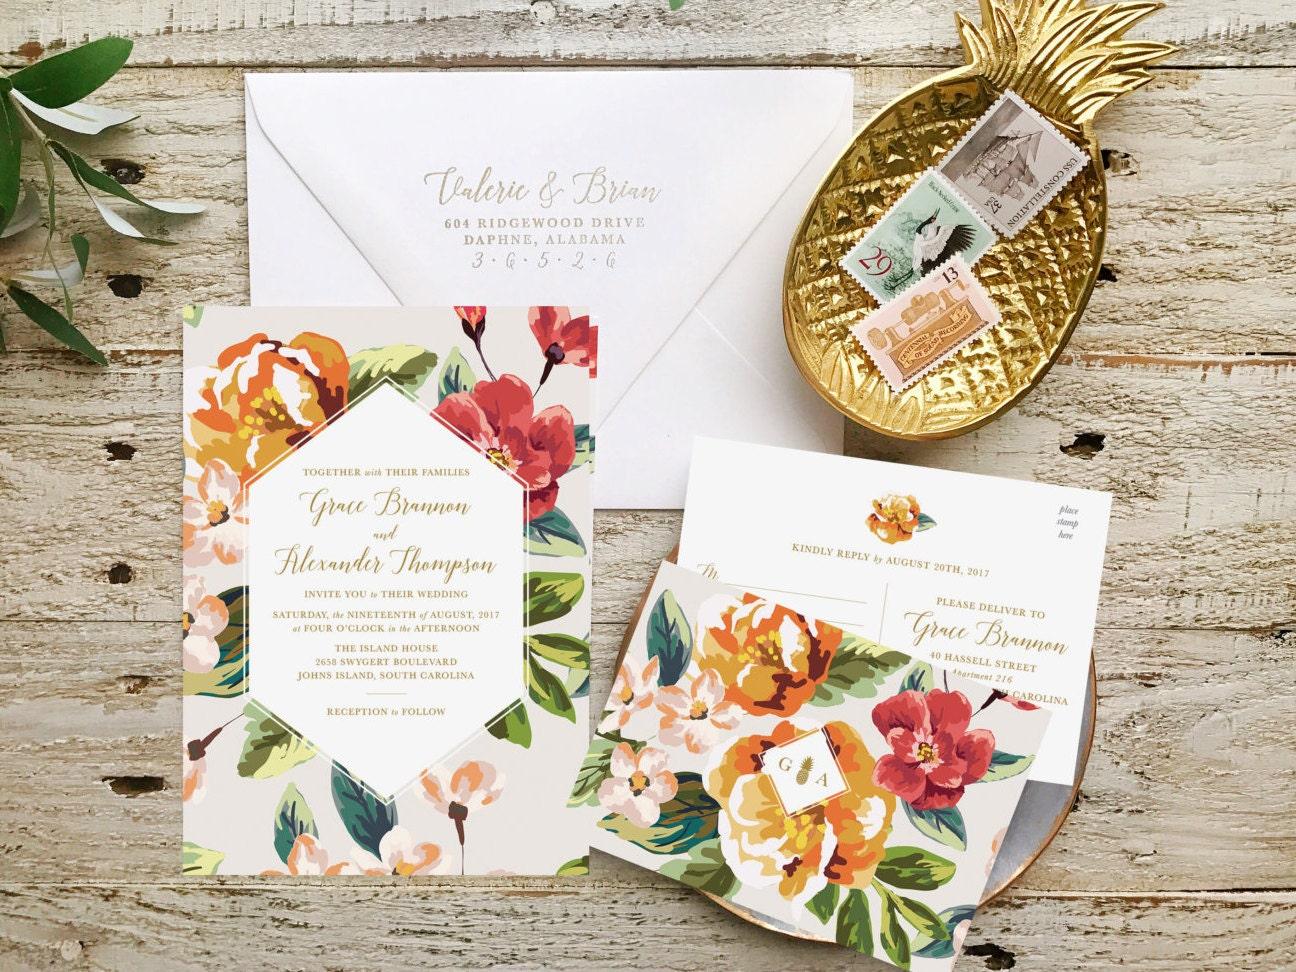 Destination wedding invitation tropical wedding by for Tropical wedding invitations